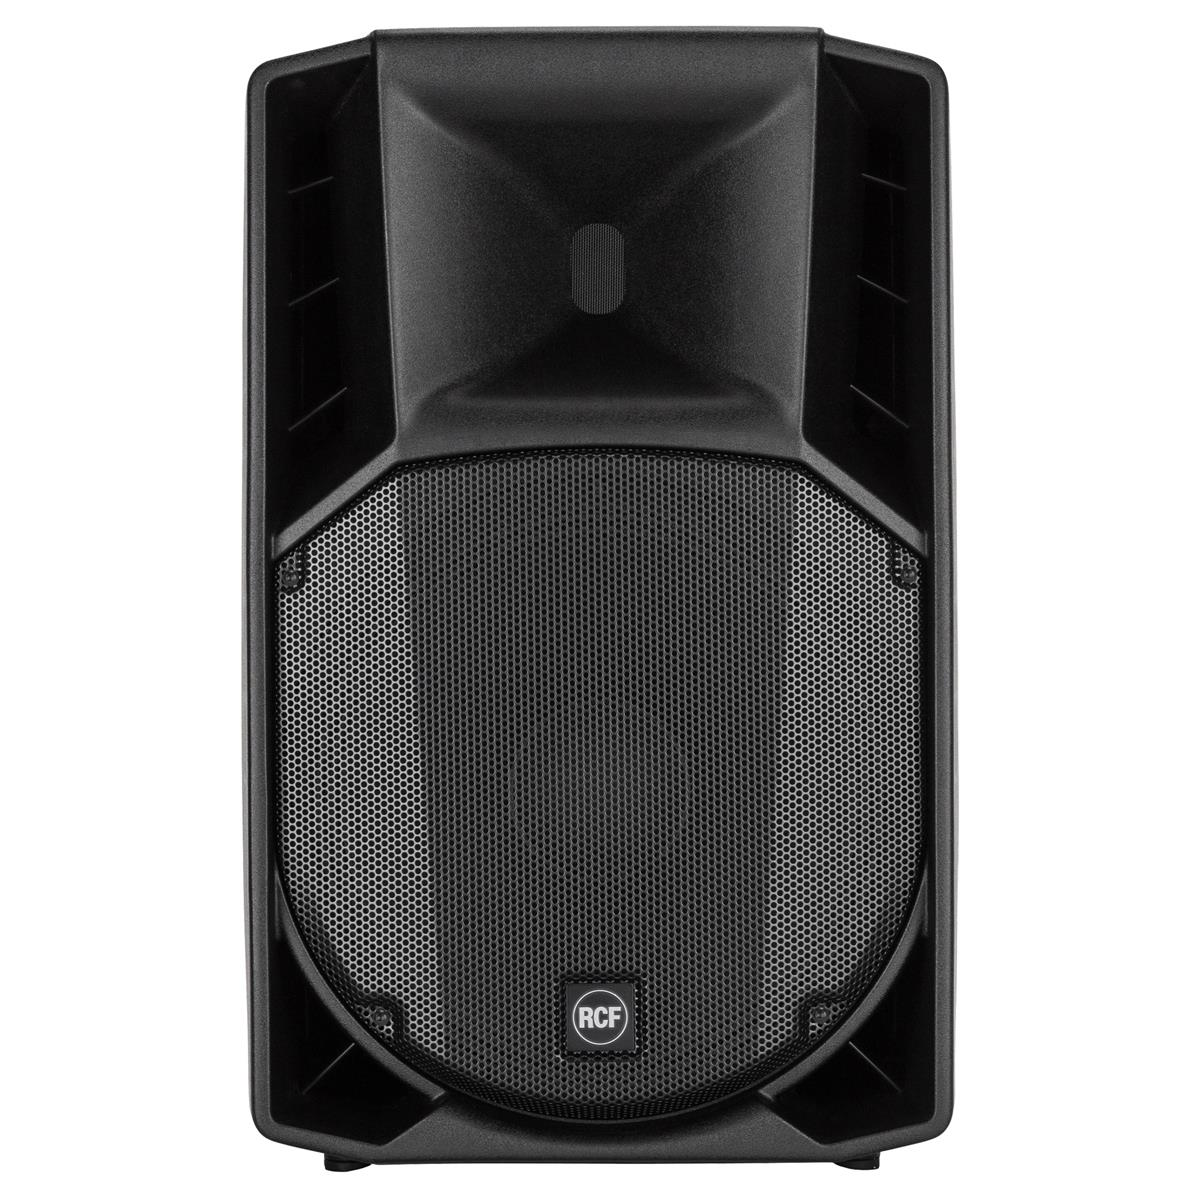 RCF Speaker system 15in + 2in, 700Wrms, 1400Wpeak